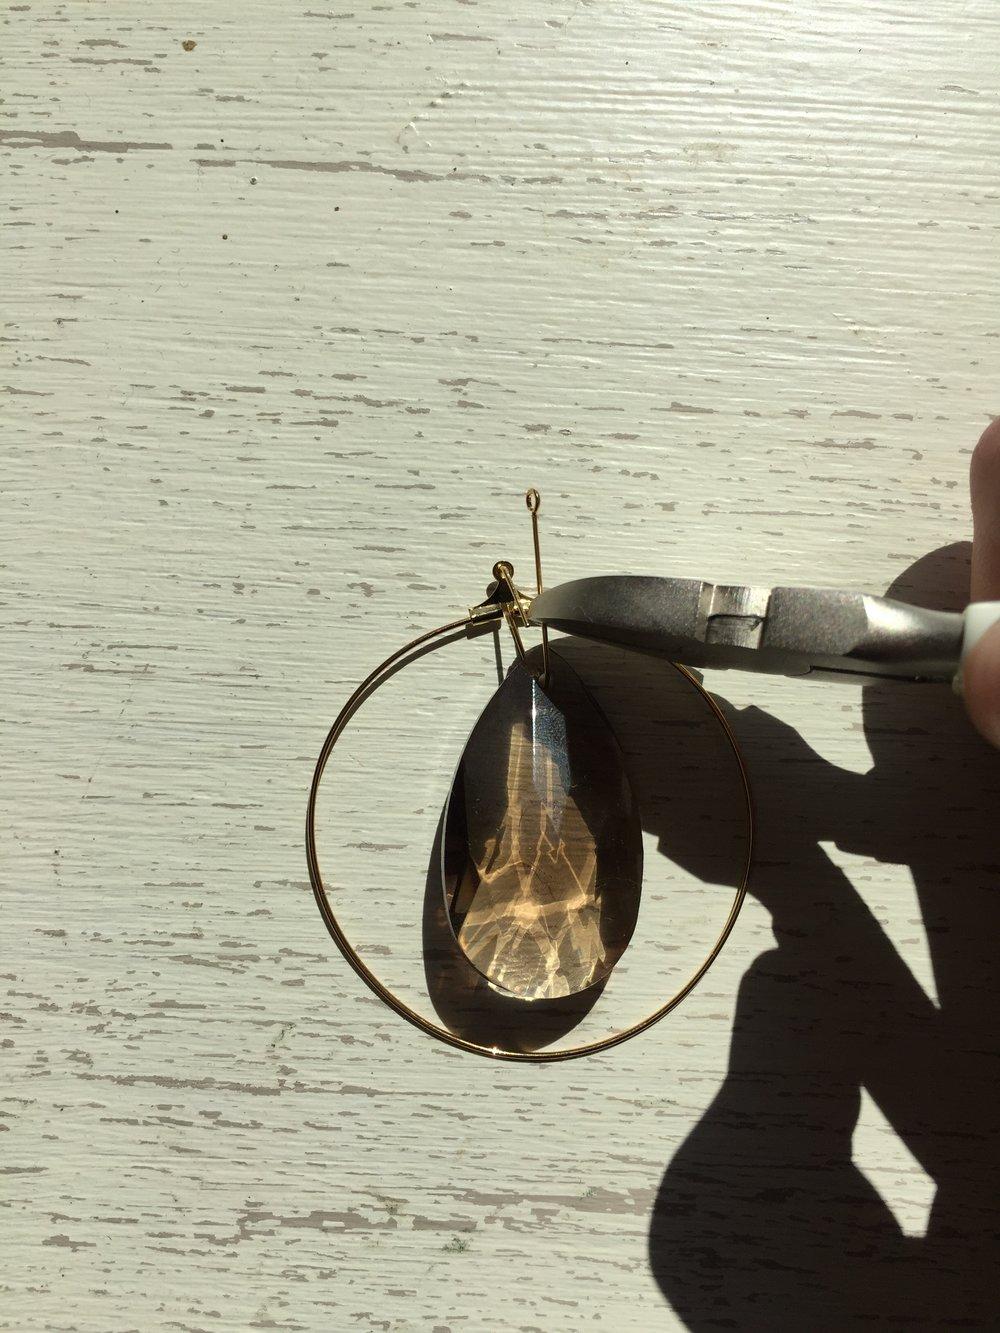 Thread through opening at top of hoop. Bend over towards gem to create loop. -